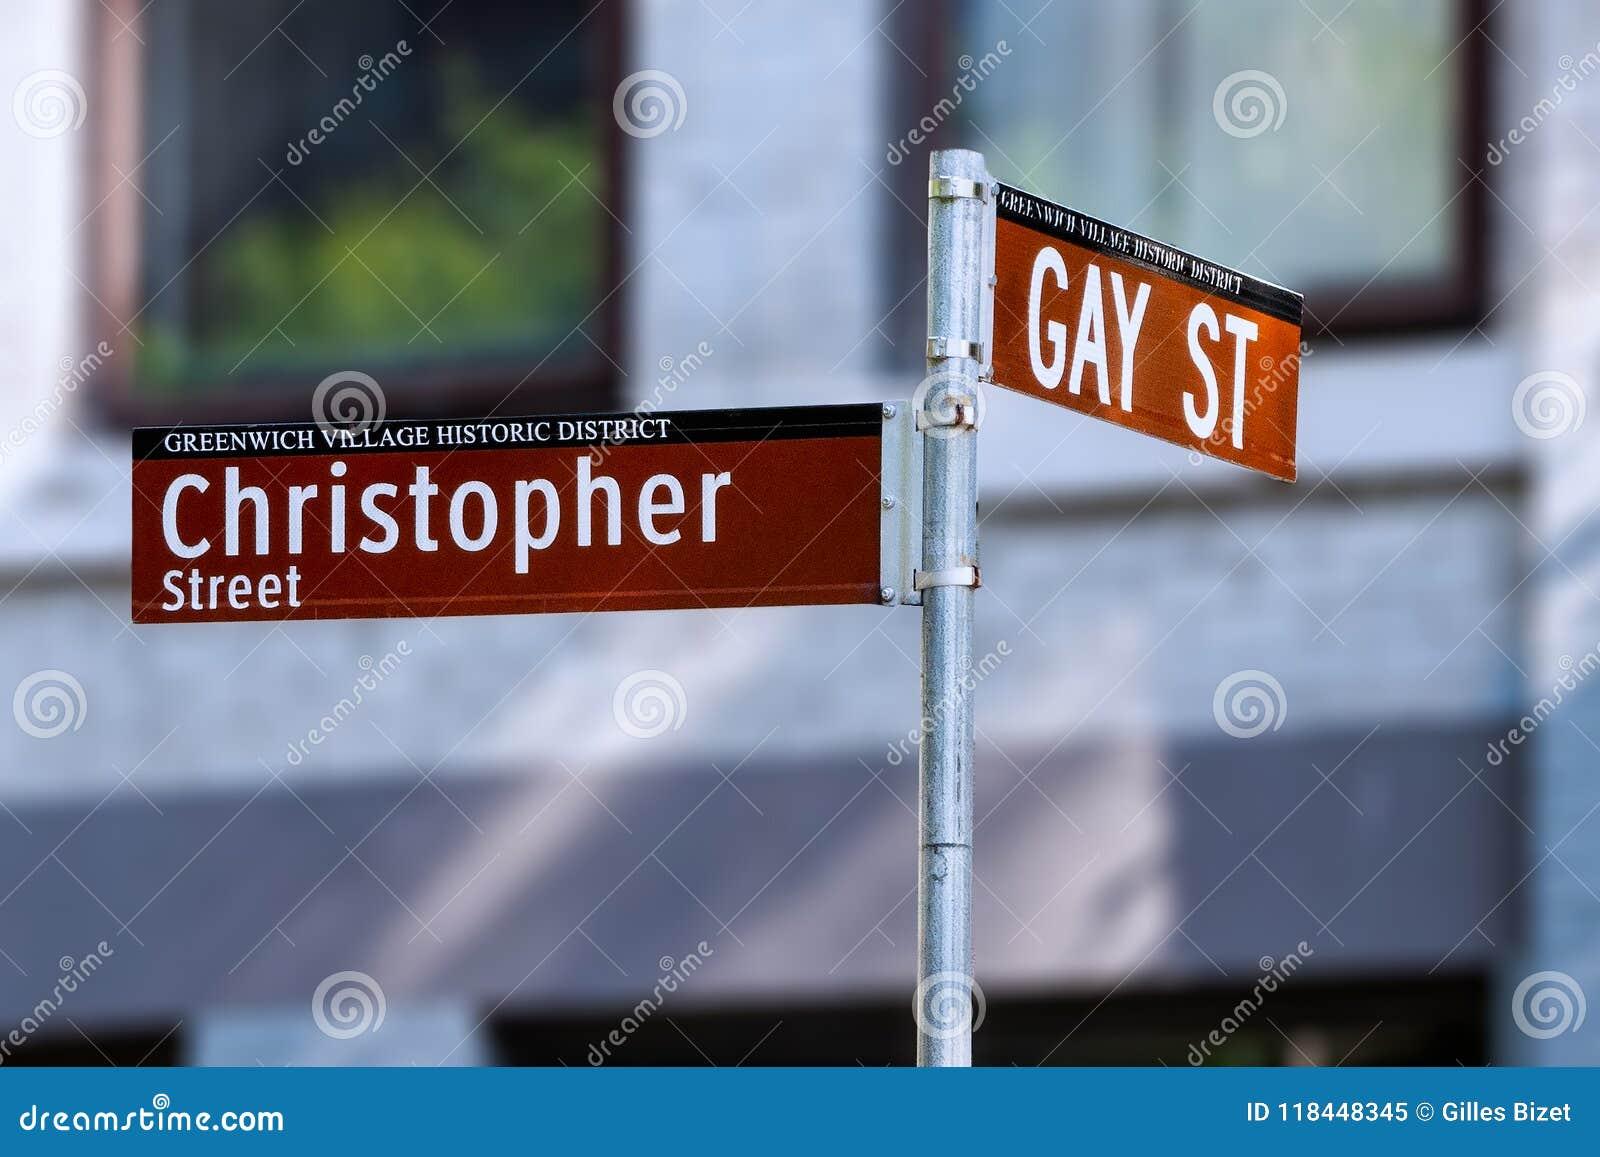 Nowy Jork - Homoseksualna ulica